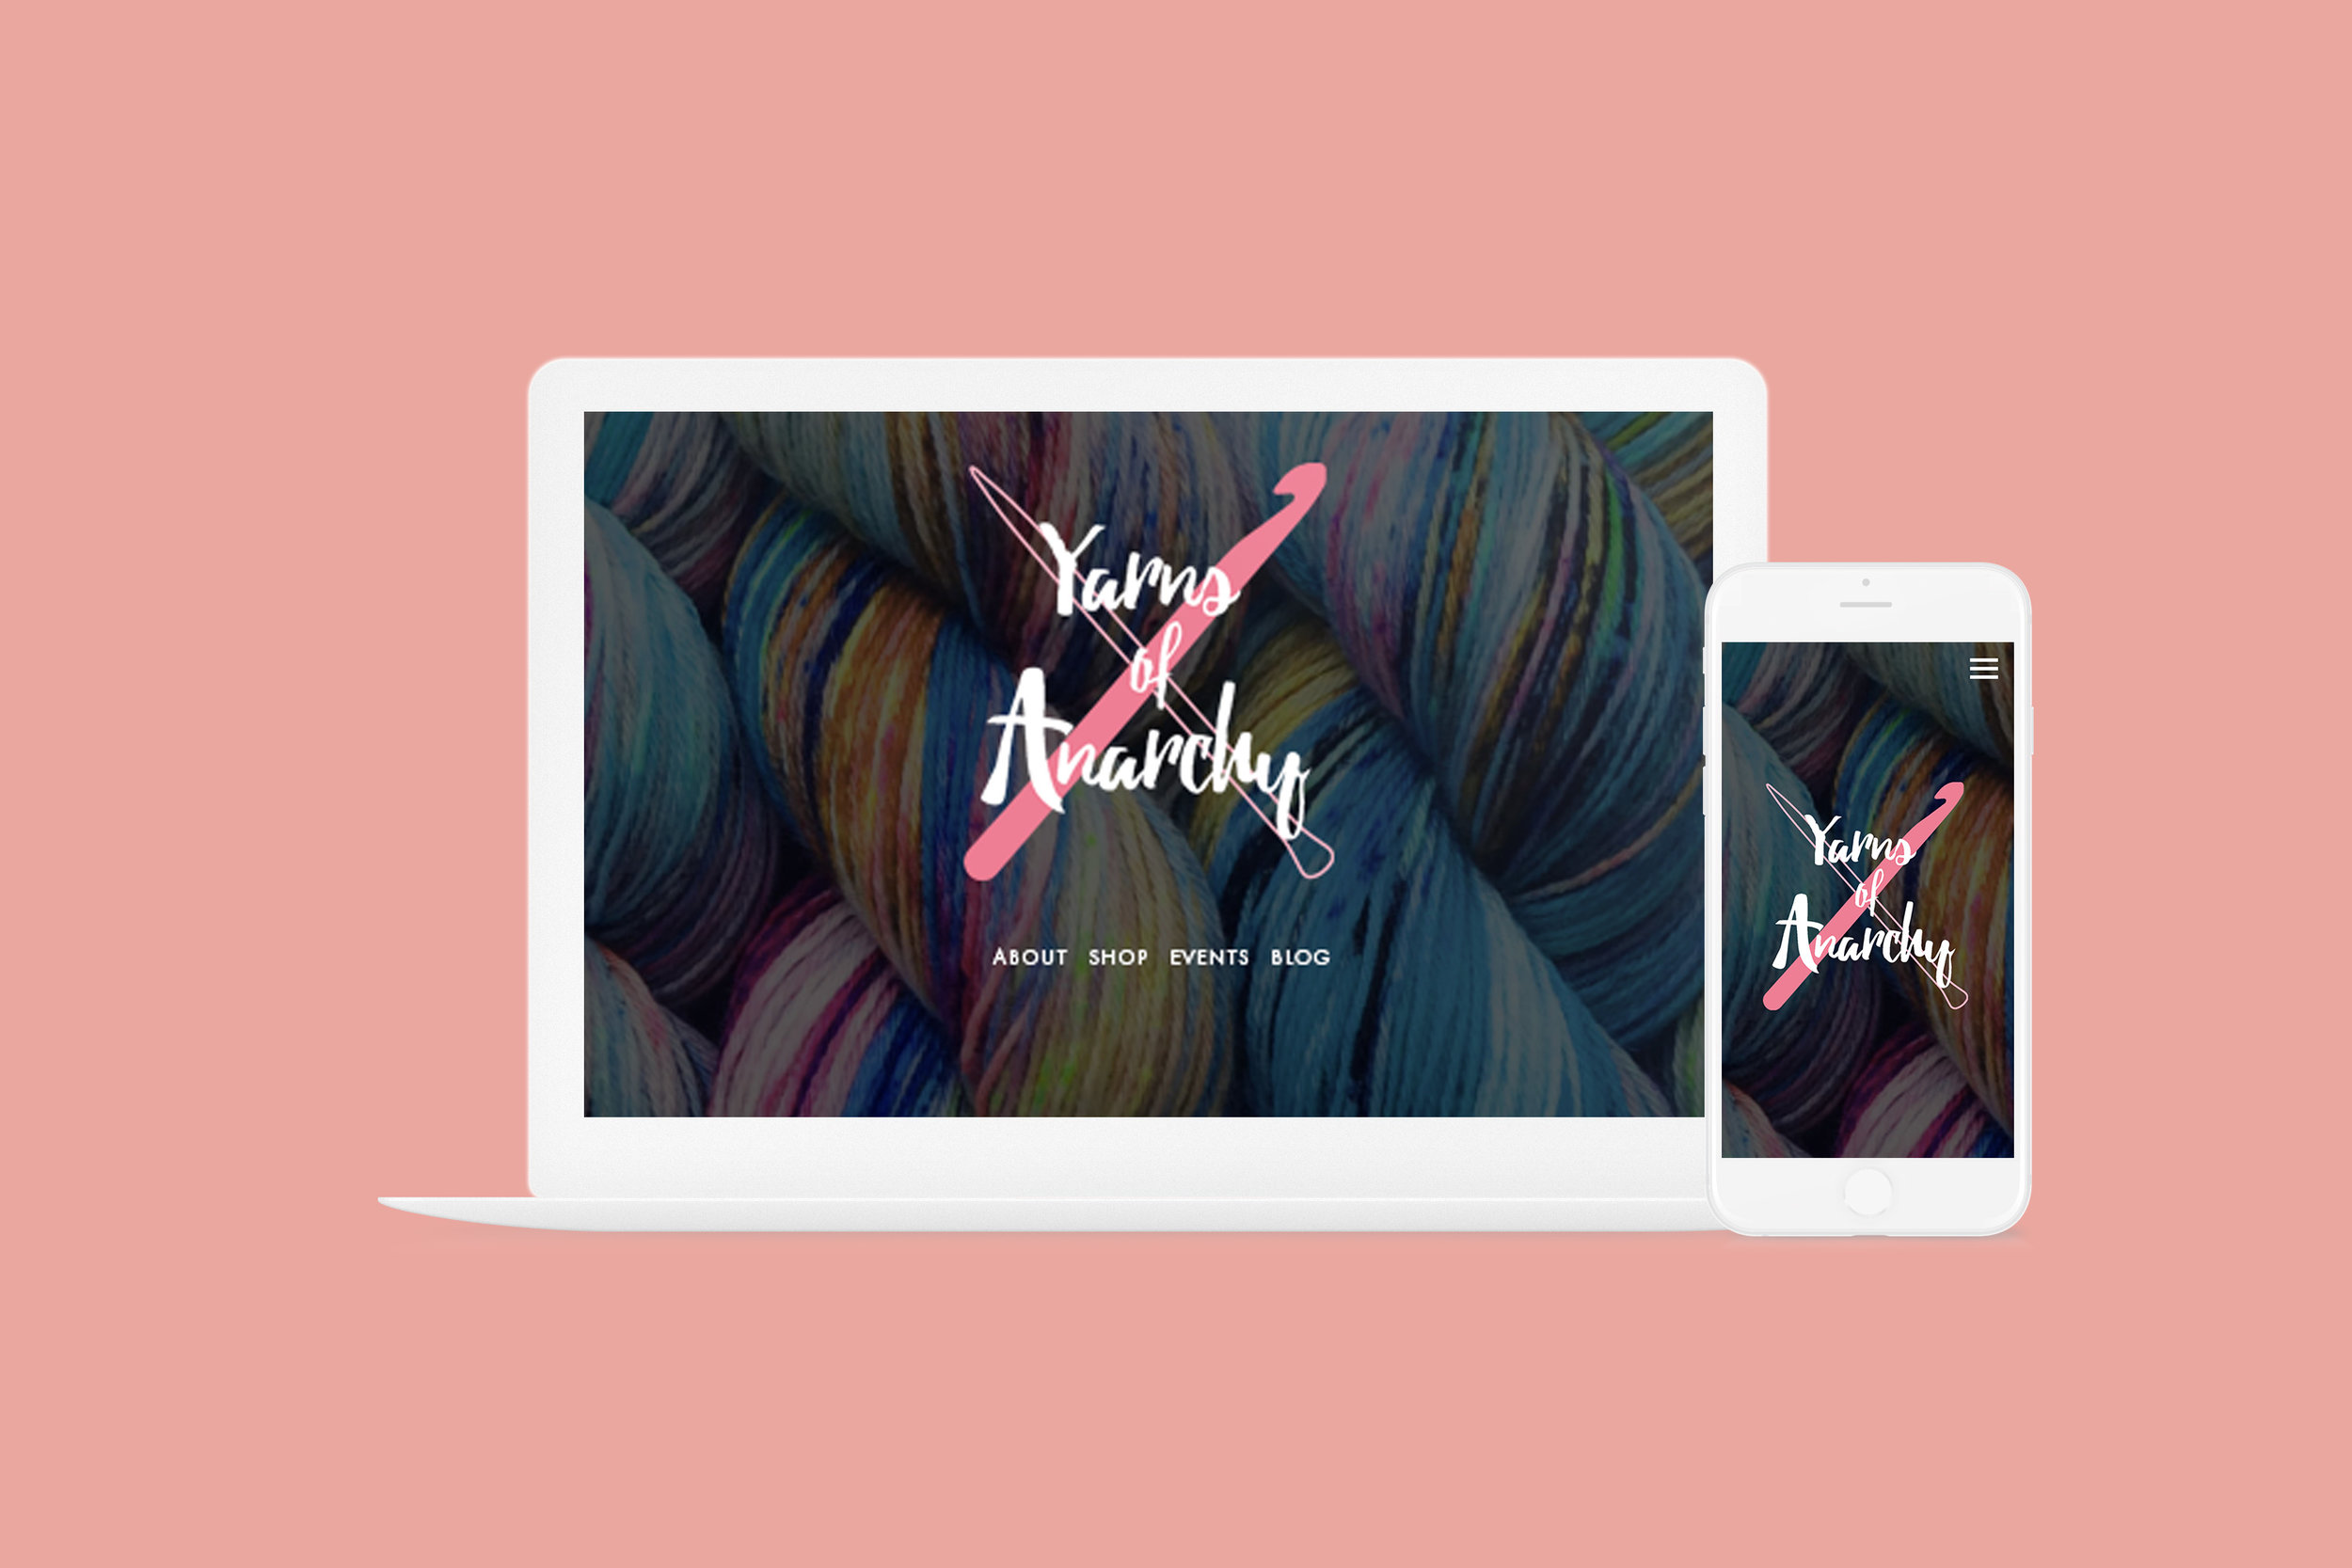 bgsd-and-yarns-of-anarchy-responsive-website-design.jpg